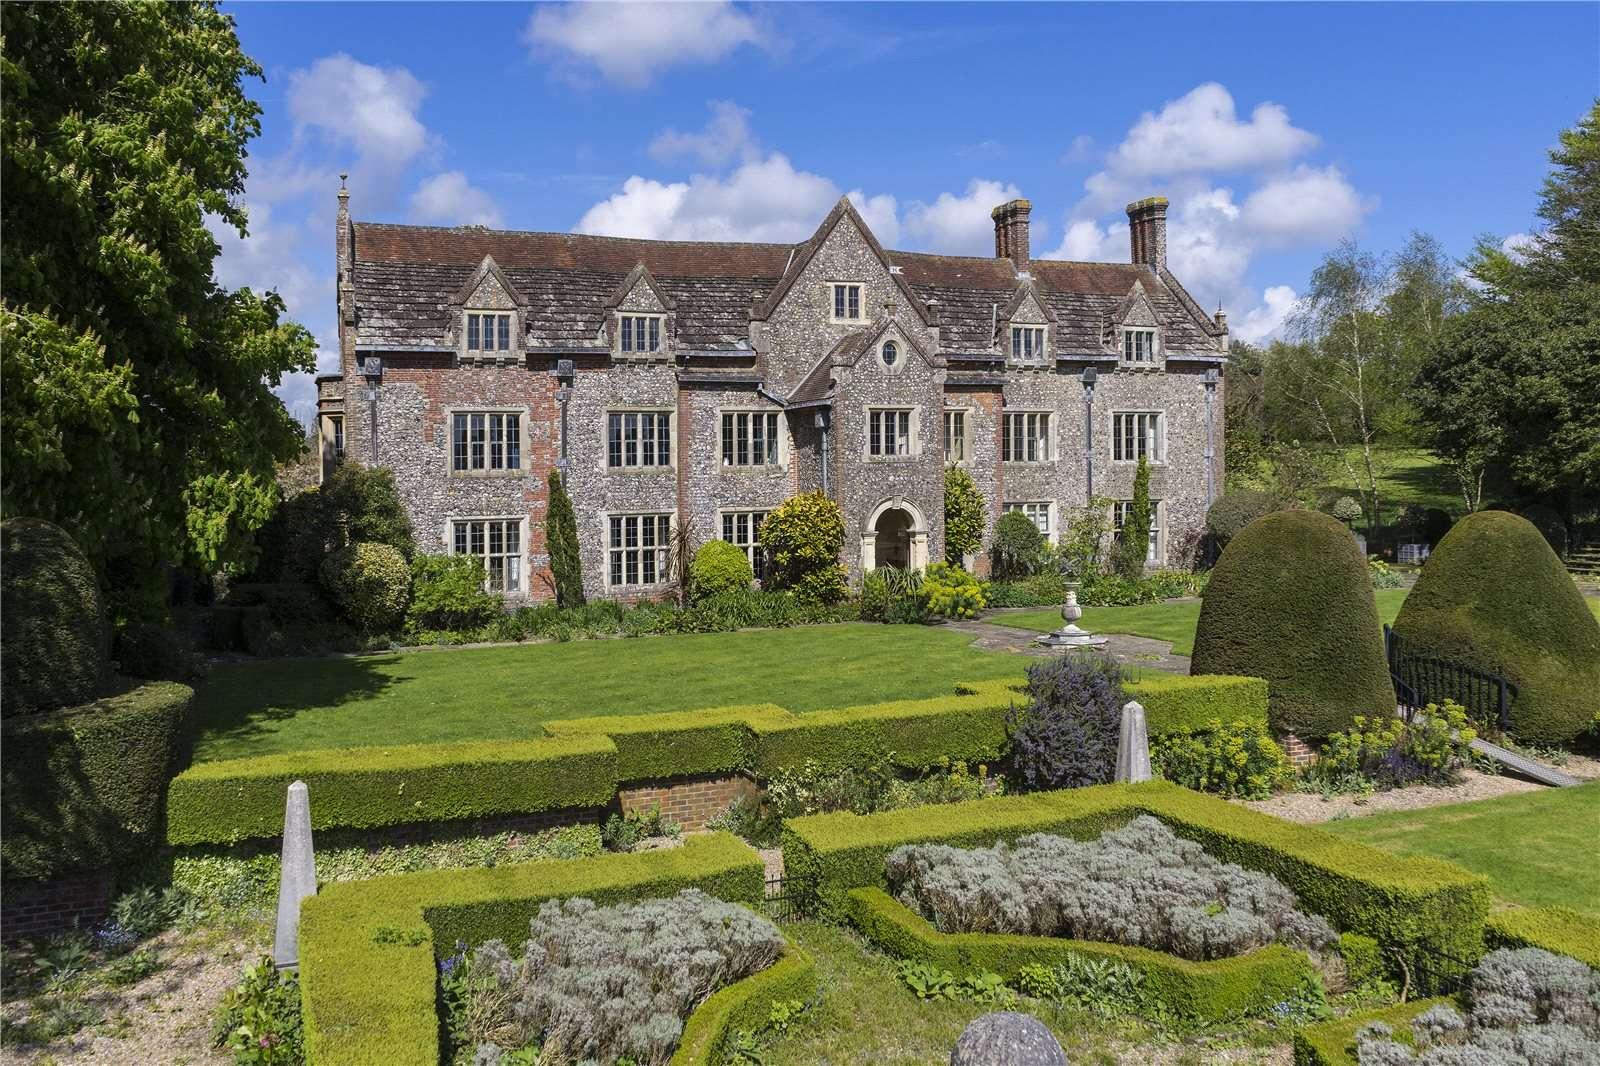 Savills | Ecclesden Lane, Angmering, Littlehampton, West Sussex, BN16 4DQ |  Properties for sale